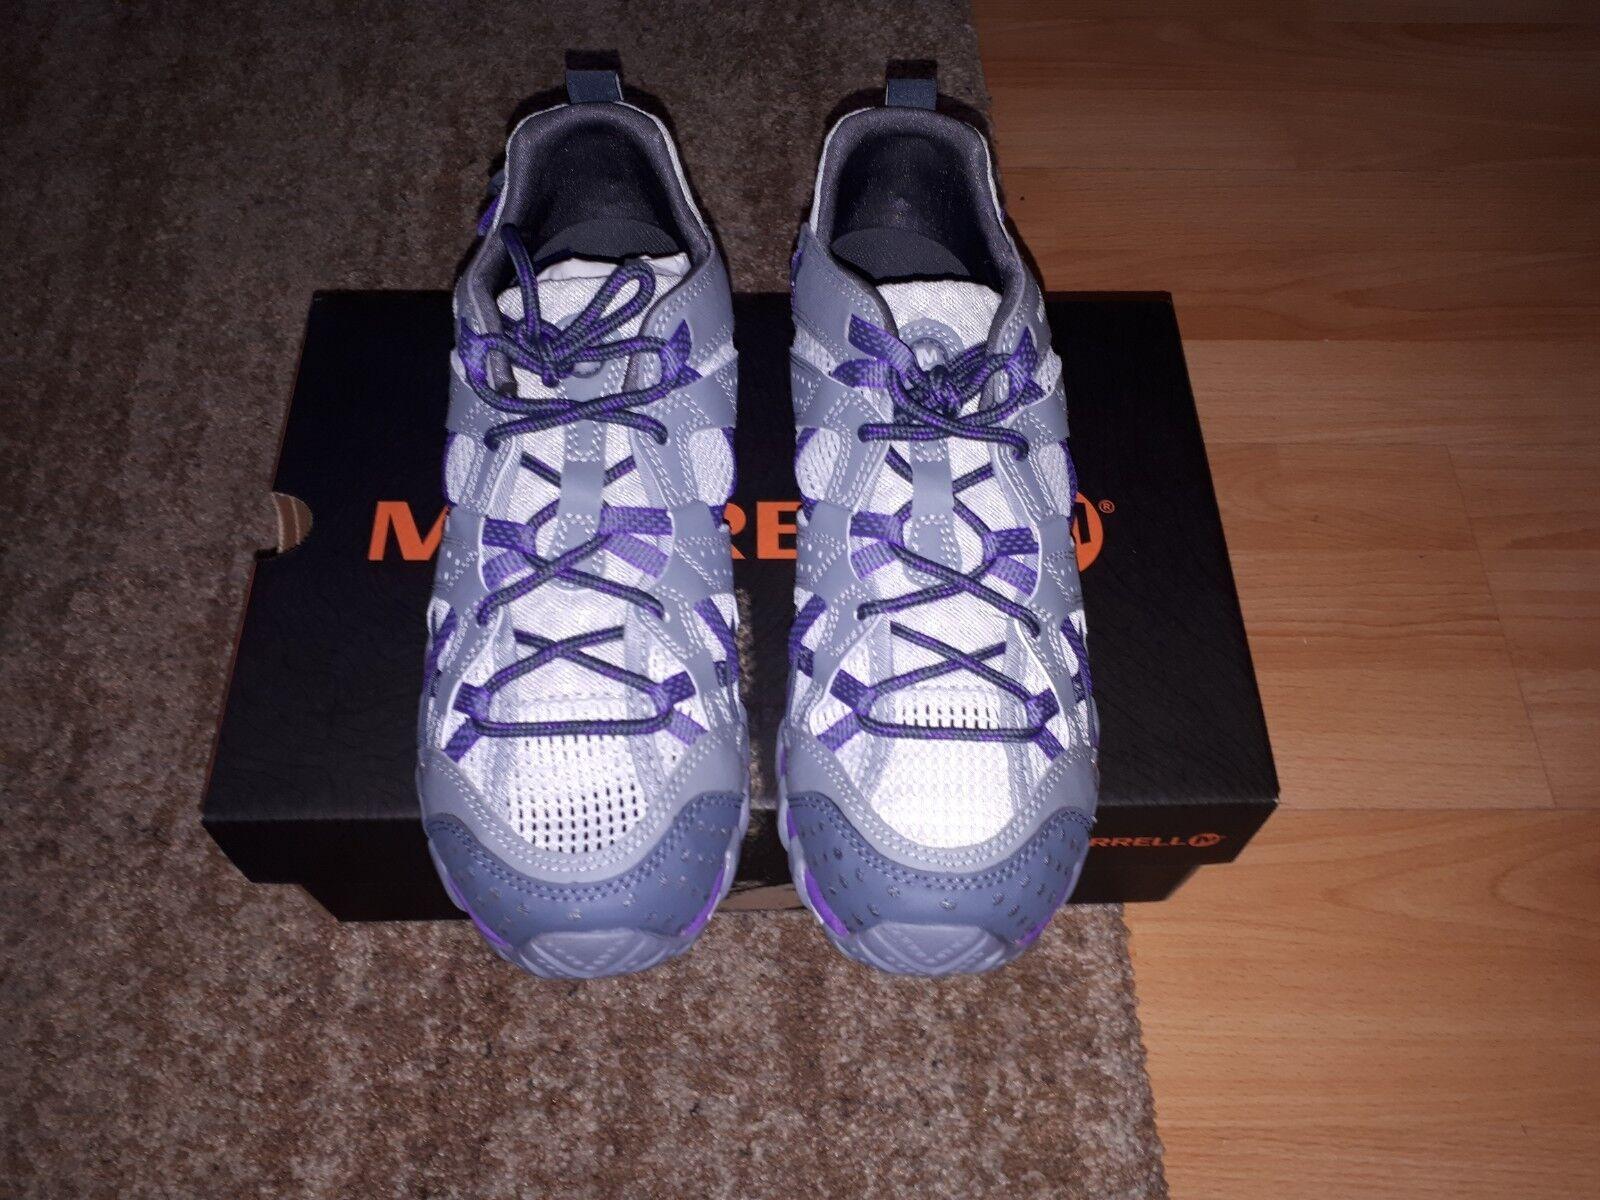 Outdoor Schuhe Damen Merrel Waterpro 39